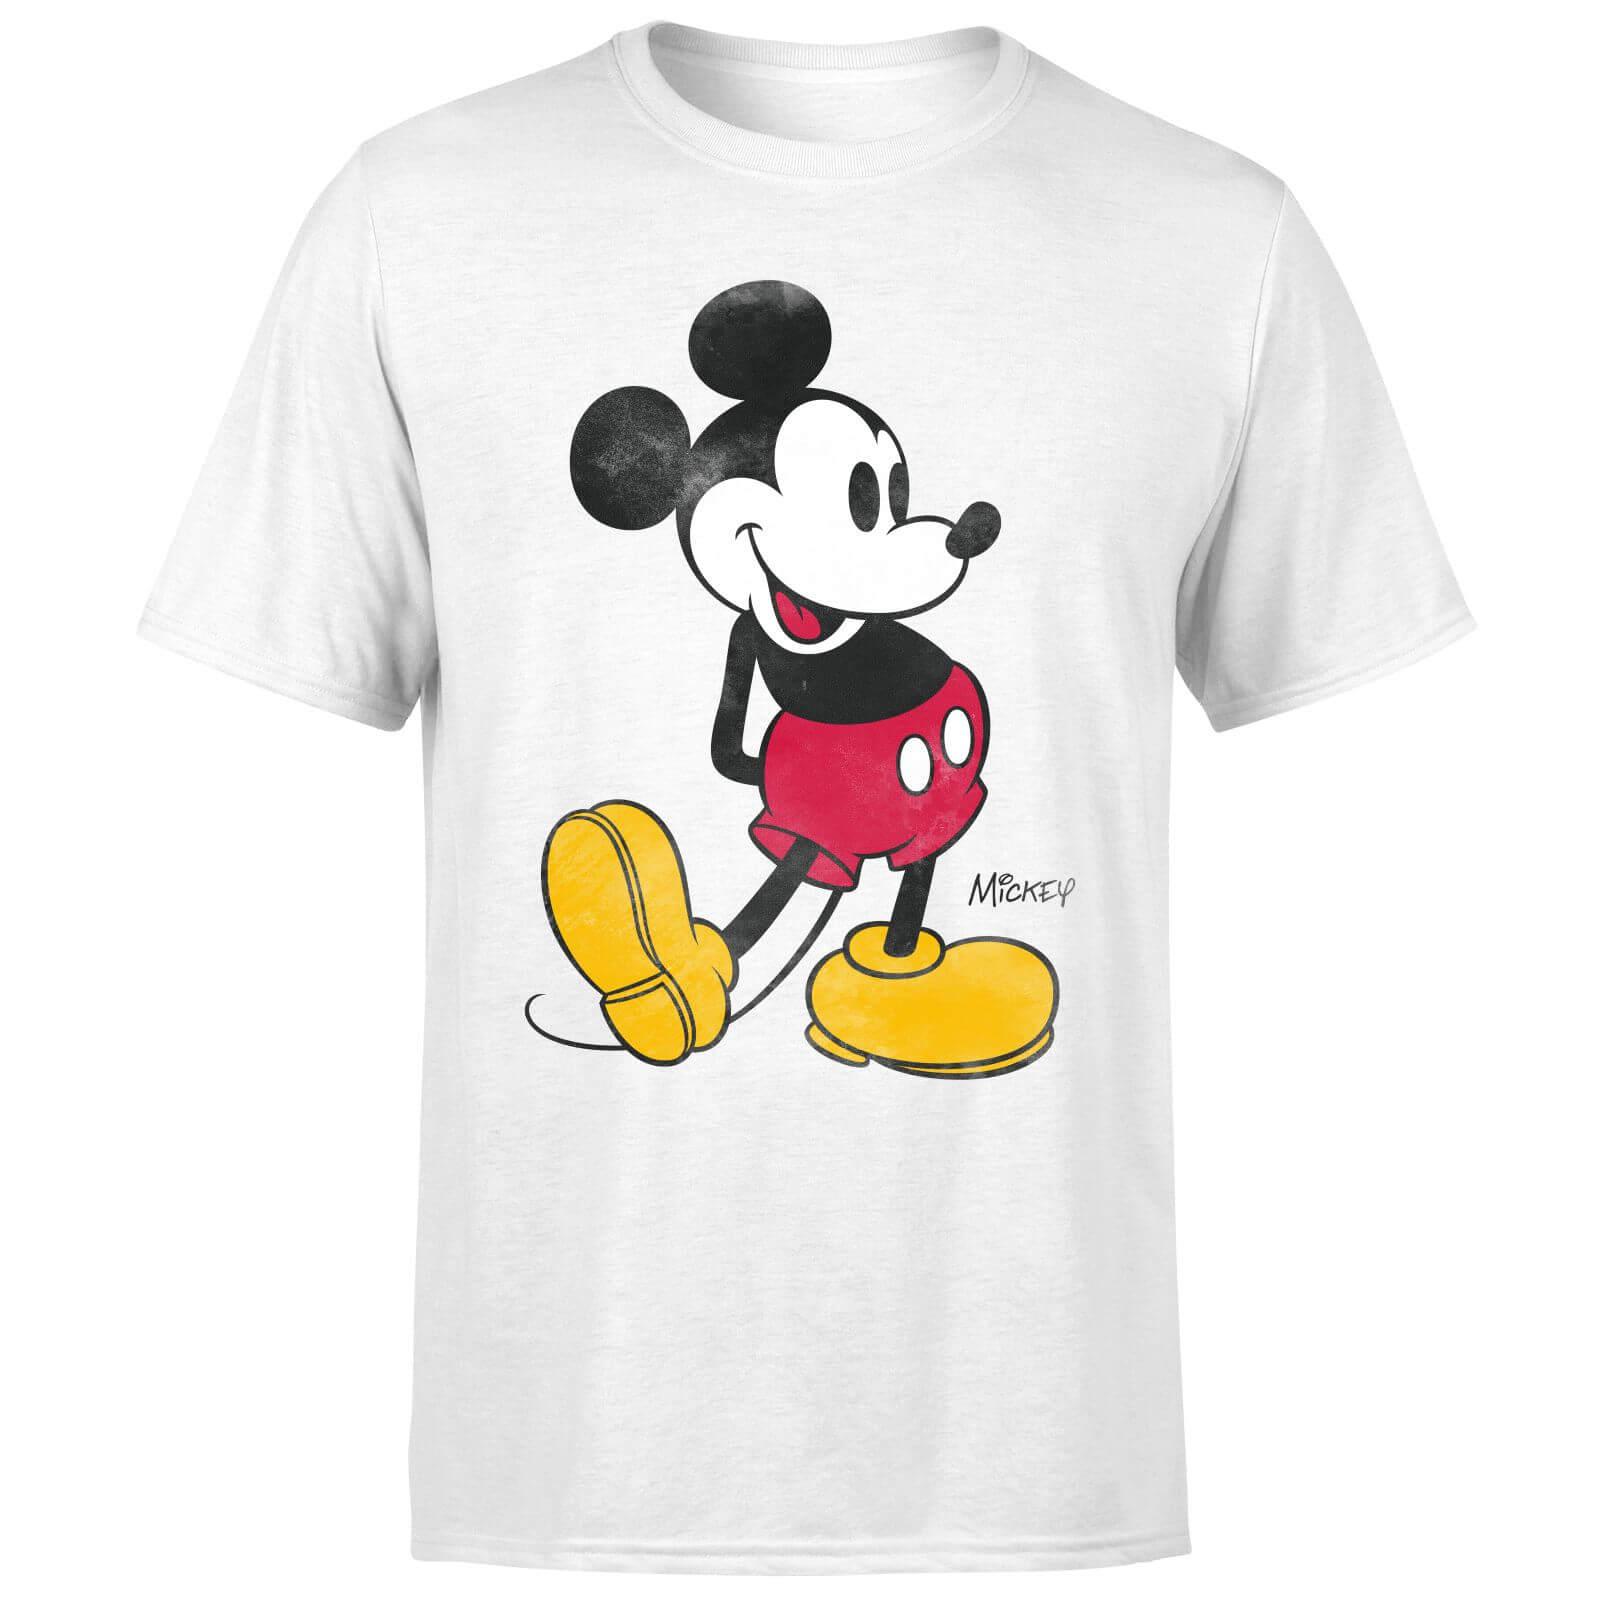 Disneys Micky Maus T-Shirt für 10,99€ (Zavvi)